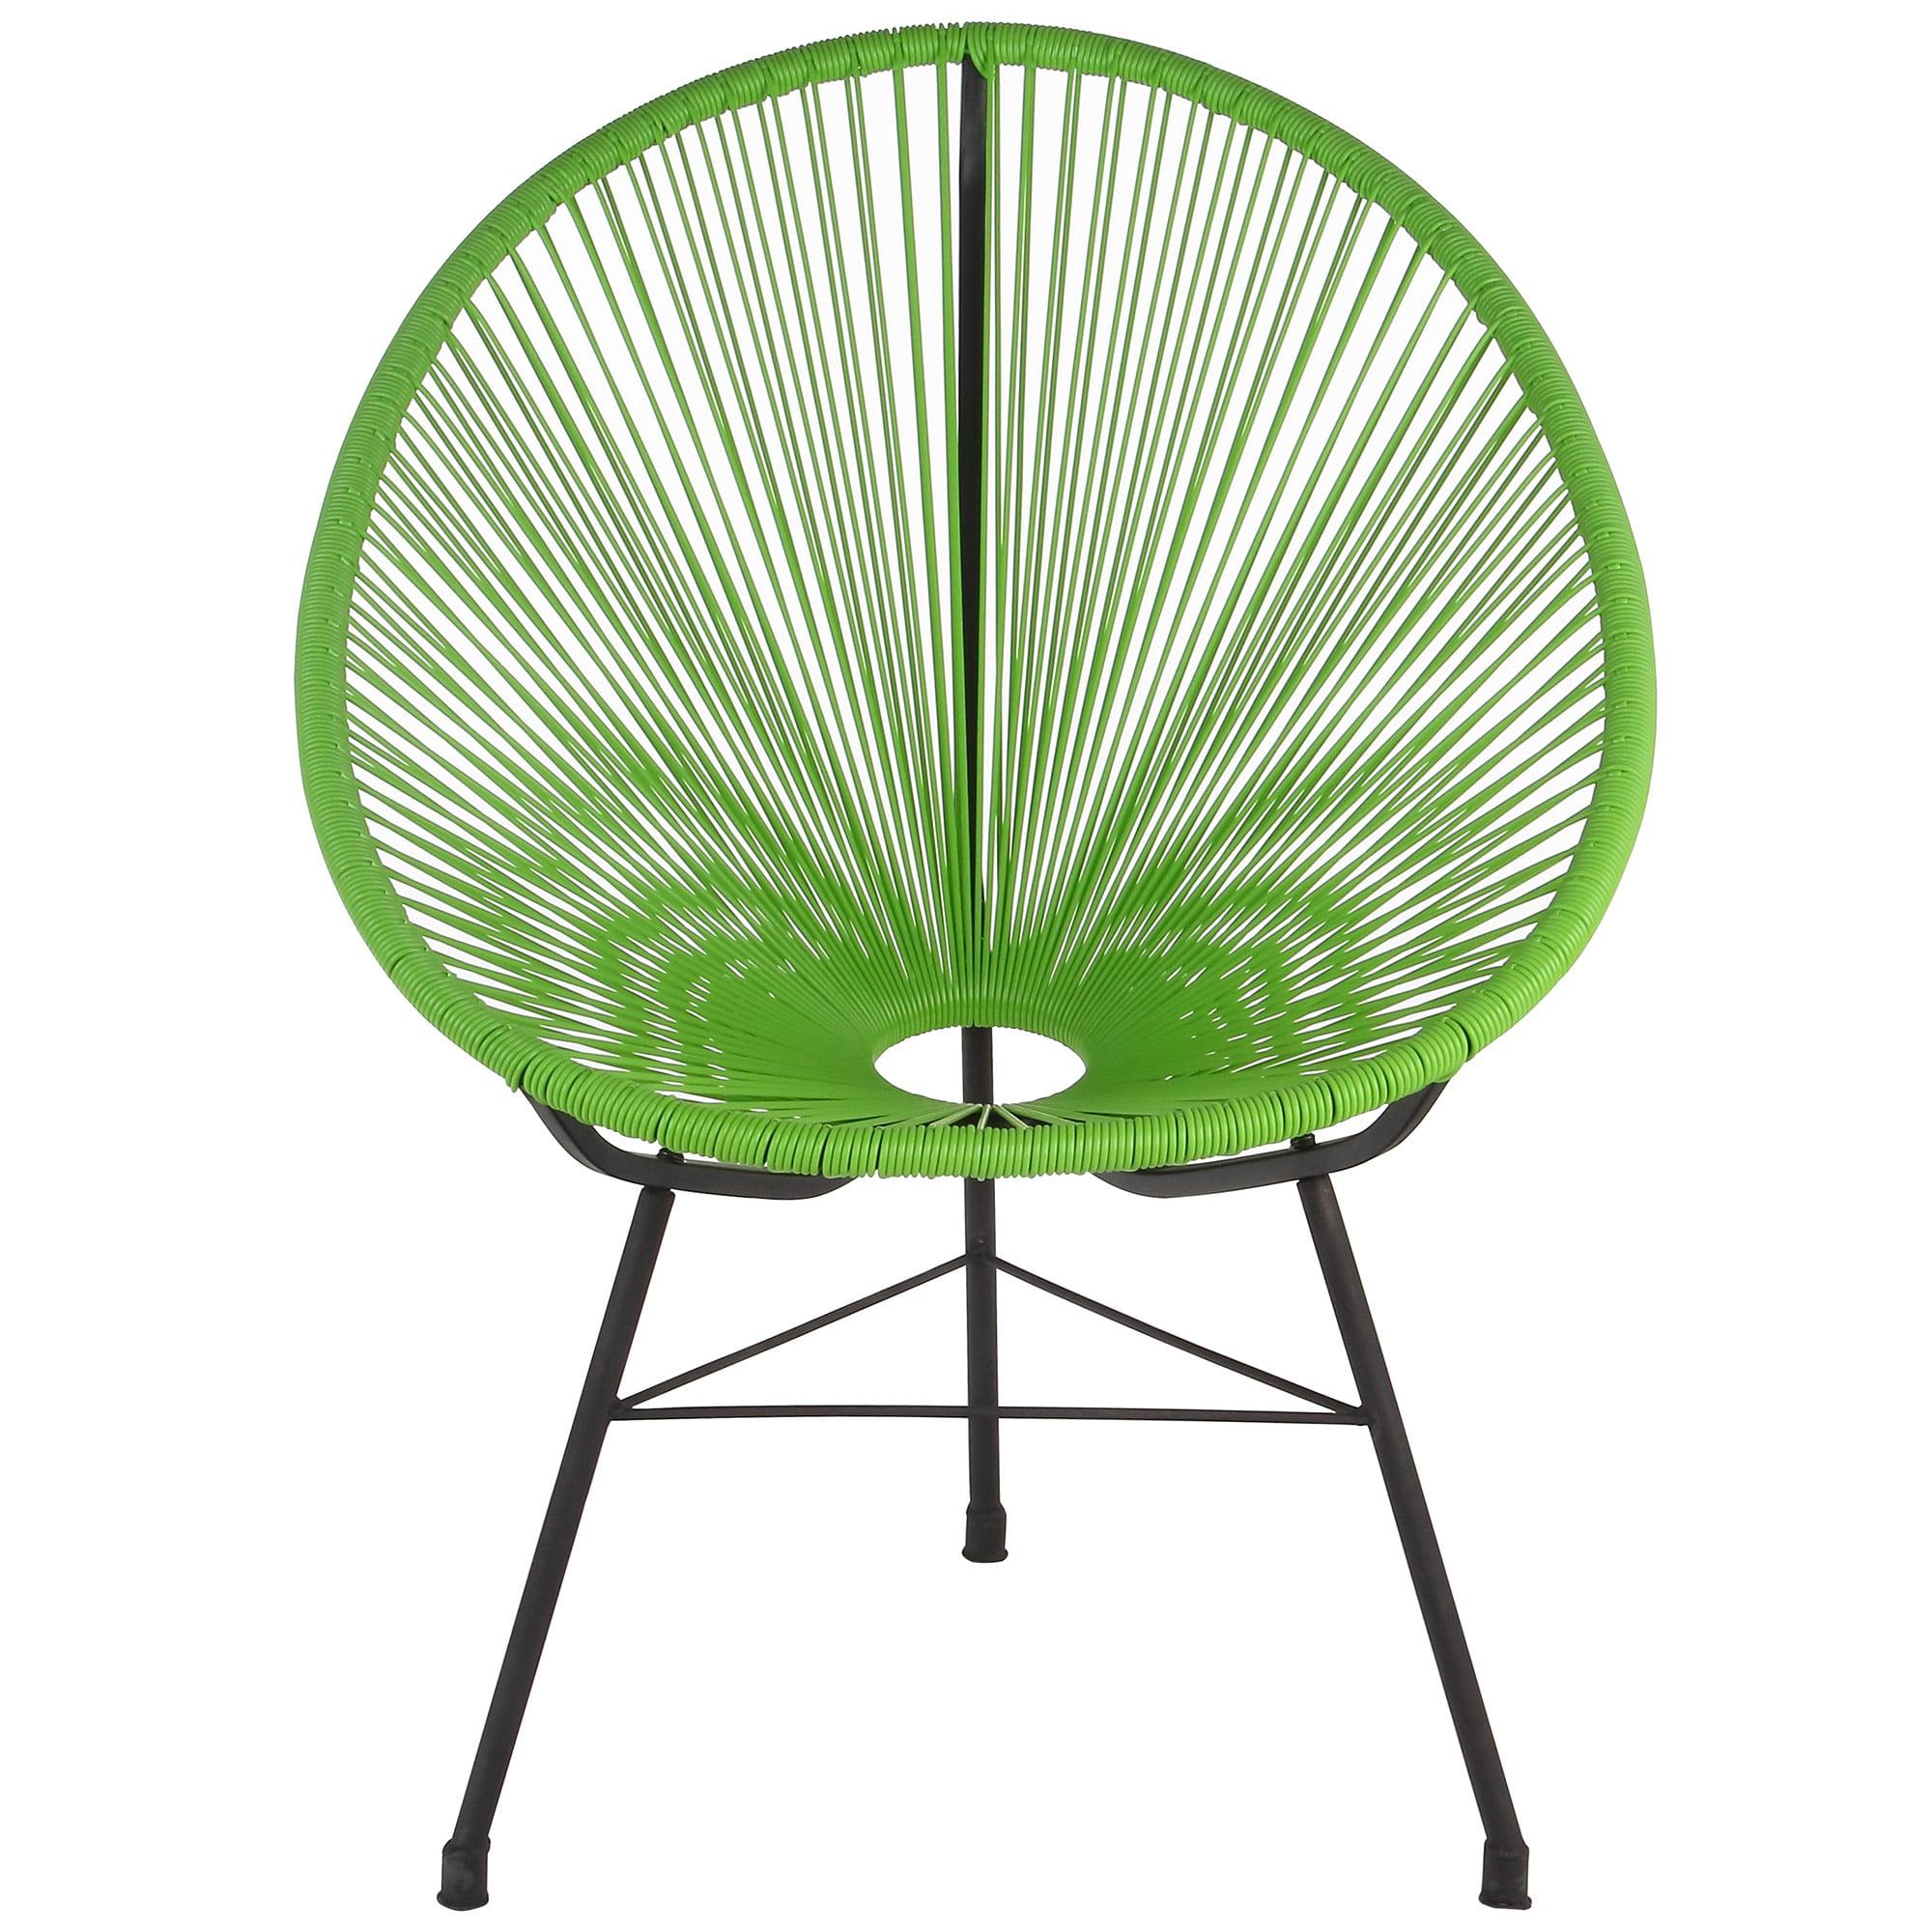 Weave Lounge Patio Chair